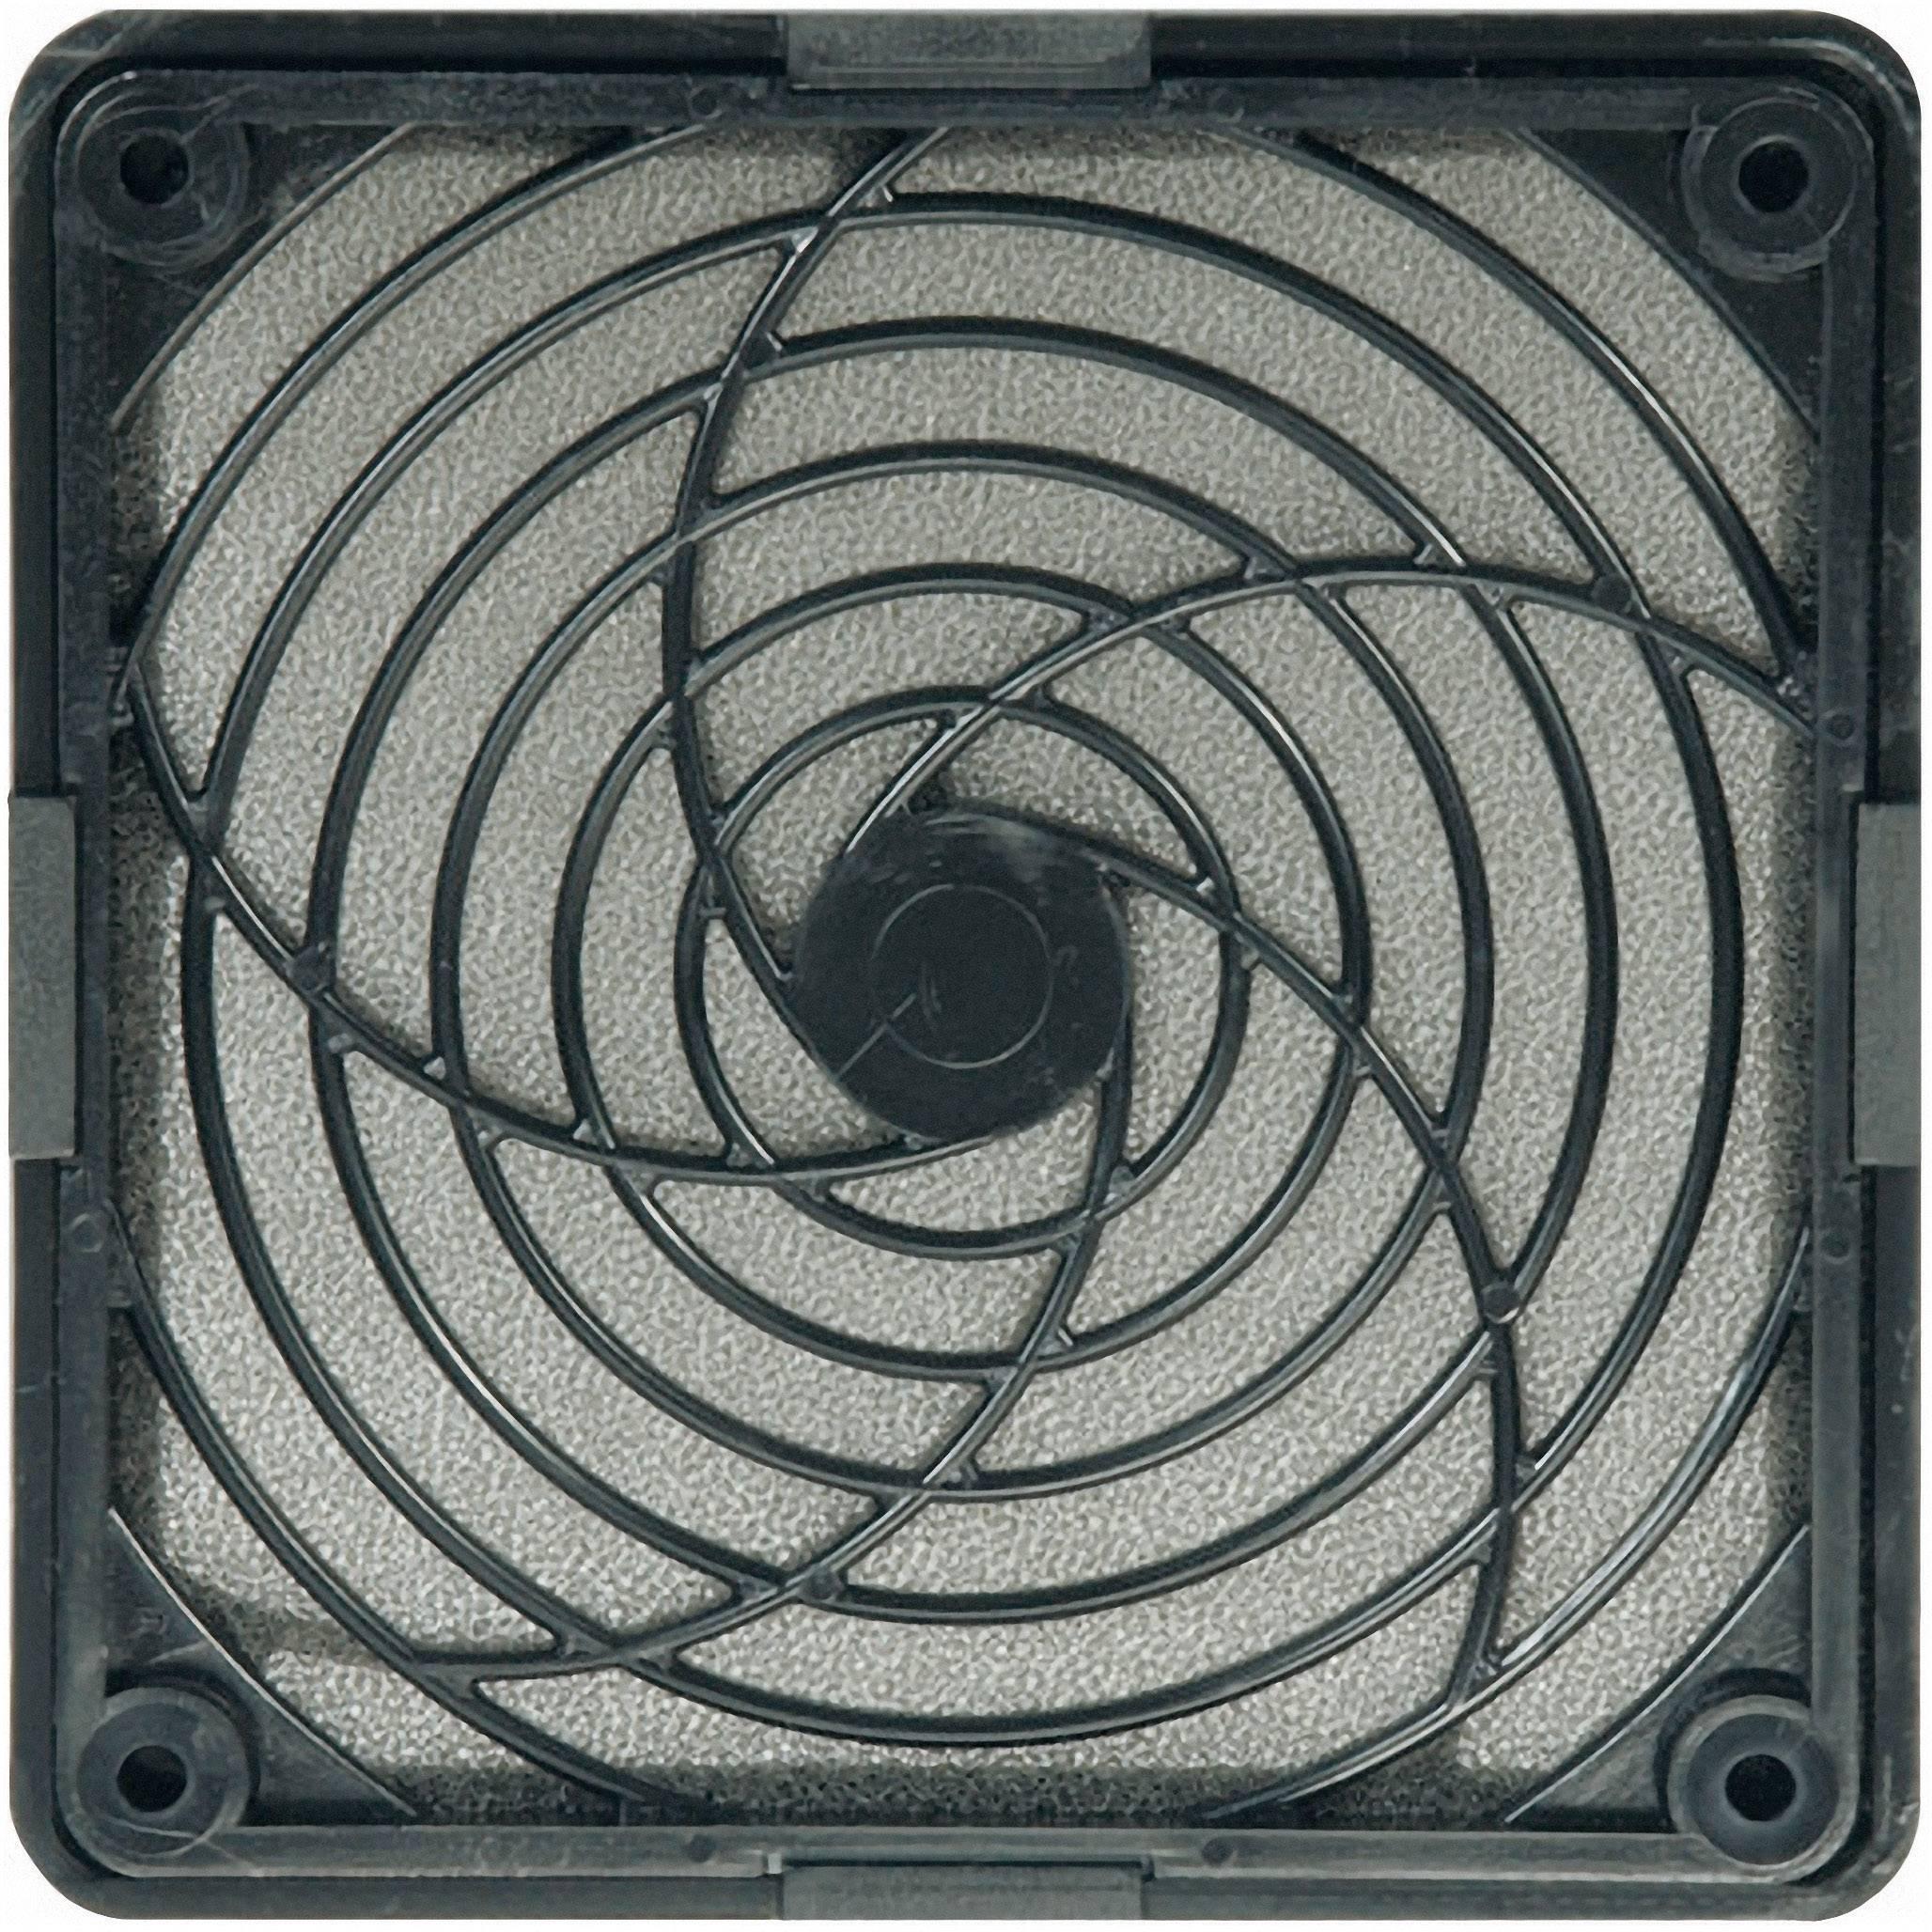 Kryt ventilátoru s filtrem Panasonic ASEN68002, 60 mm x 60 mm